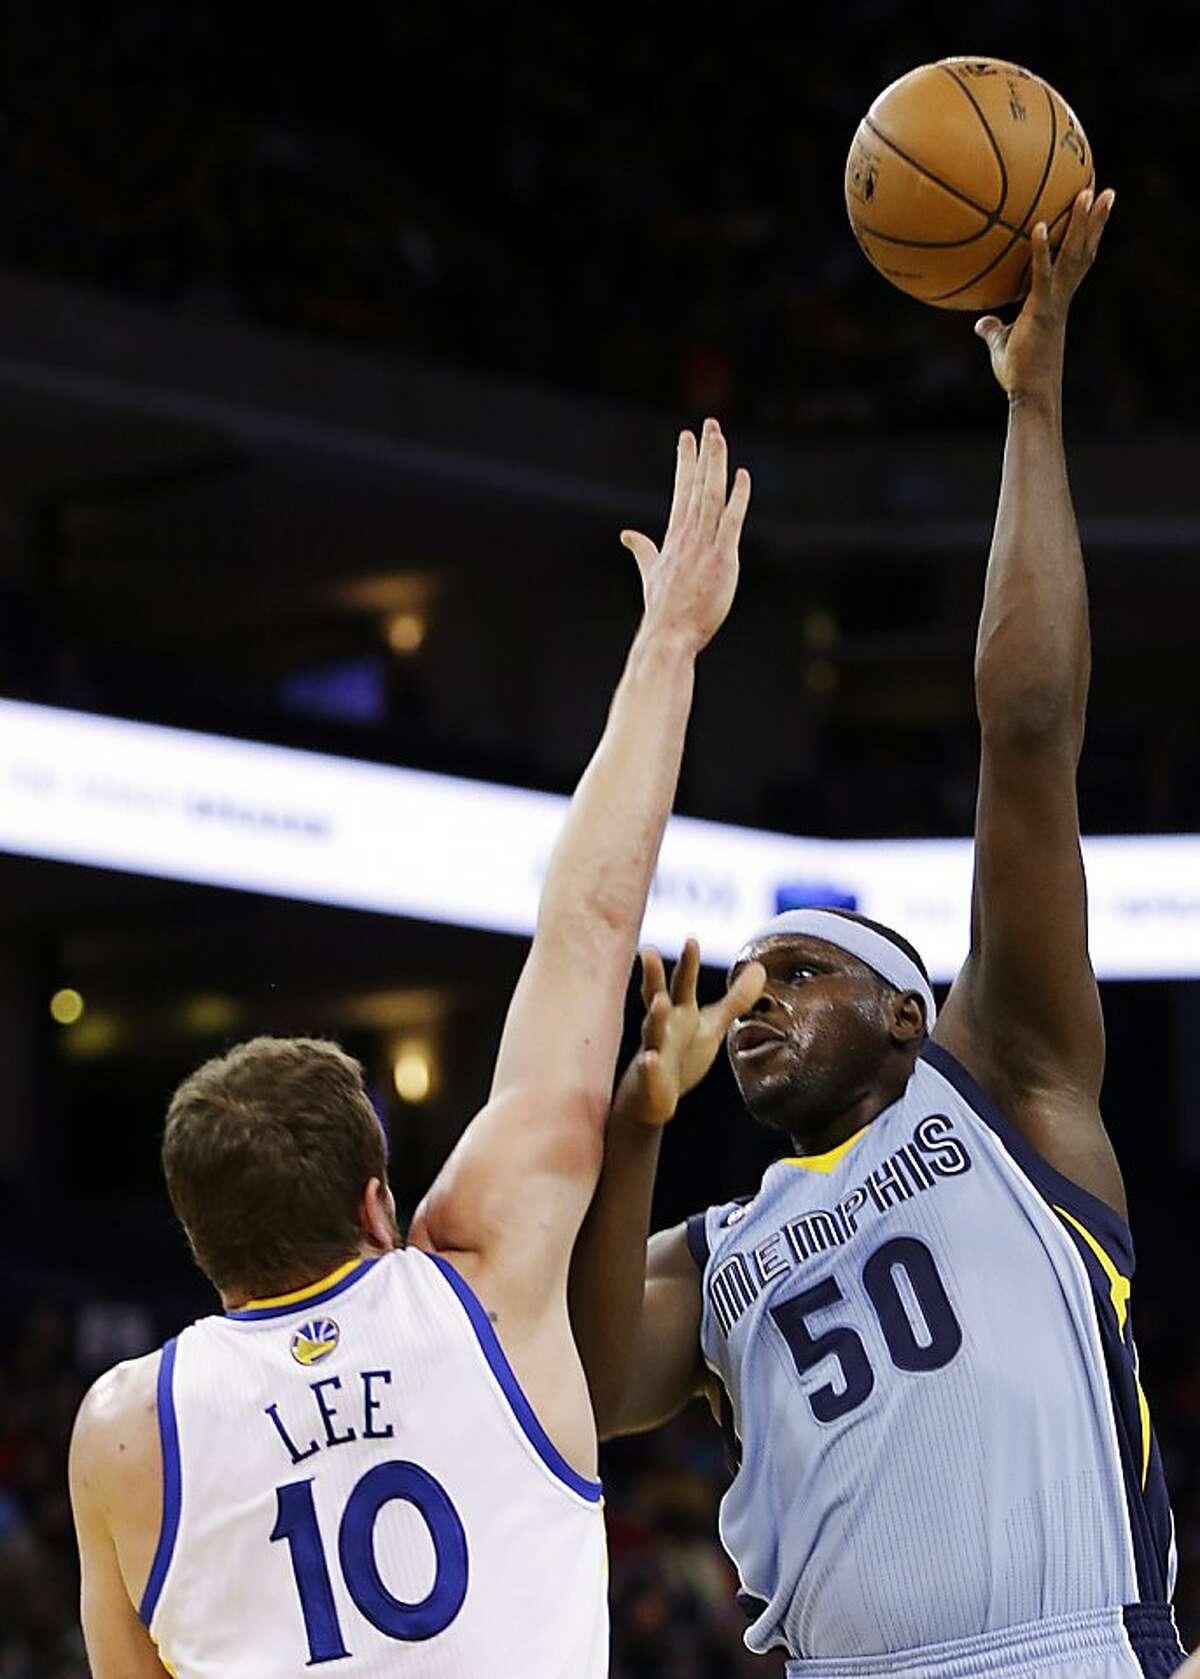 Memphis Grizzlies' Zach Randolph (50) shoots over Golden State Warriors' David Lee during the first half of an NBA basketball game, Wednesday, Jan. 9, 2013, in Oakland, Calif. (AP Photo/Ben Margot)